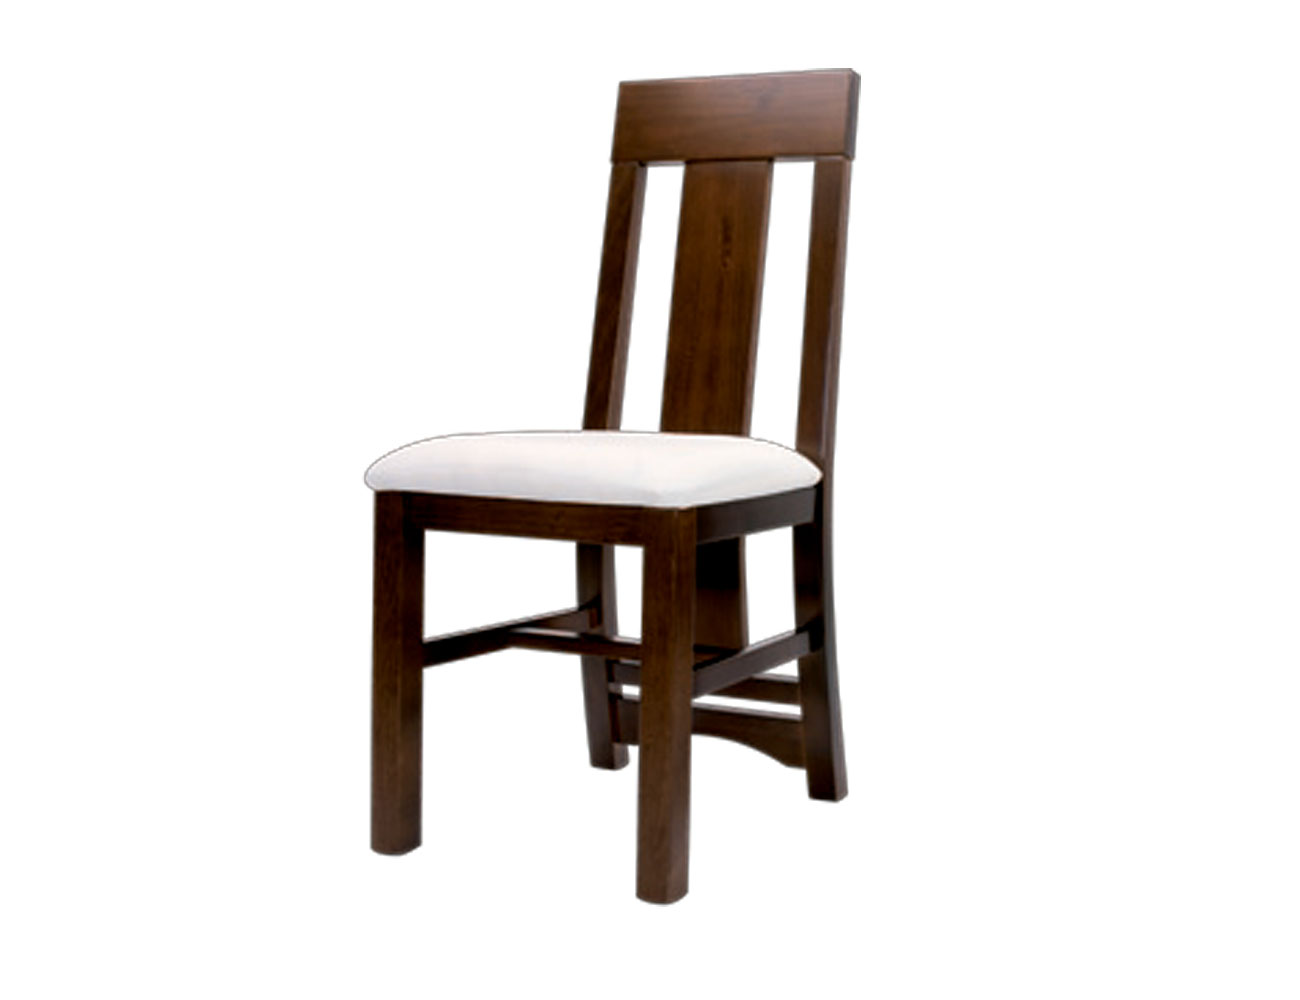 C0 51 silla madera tapizada3